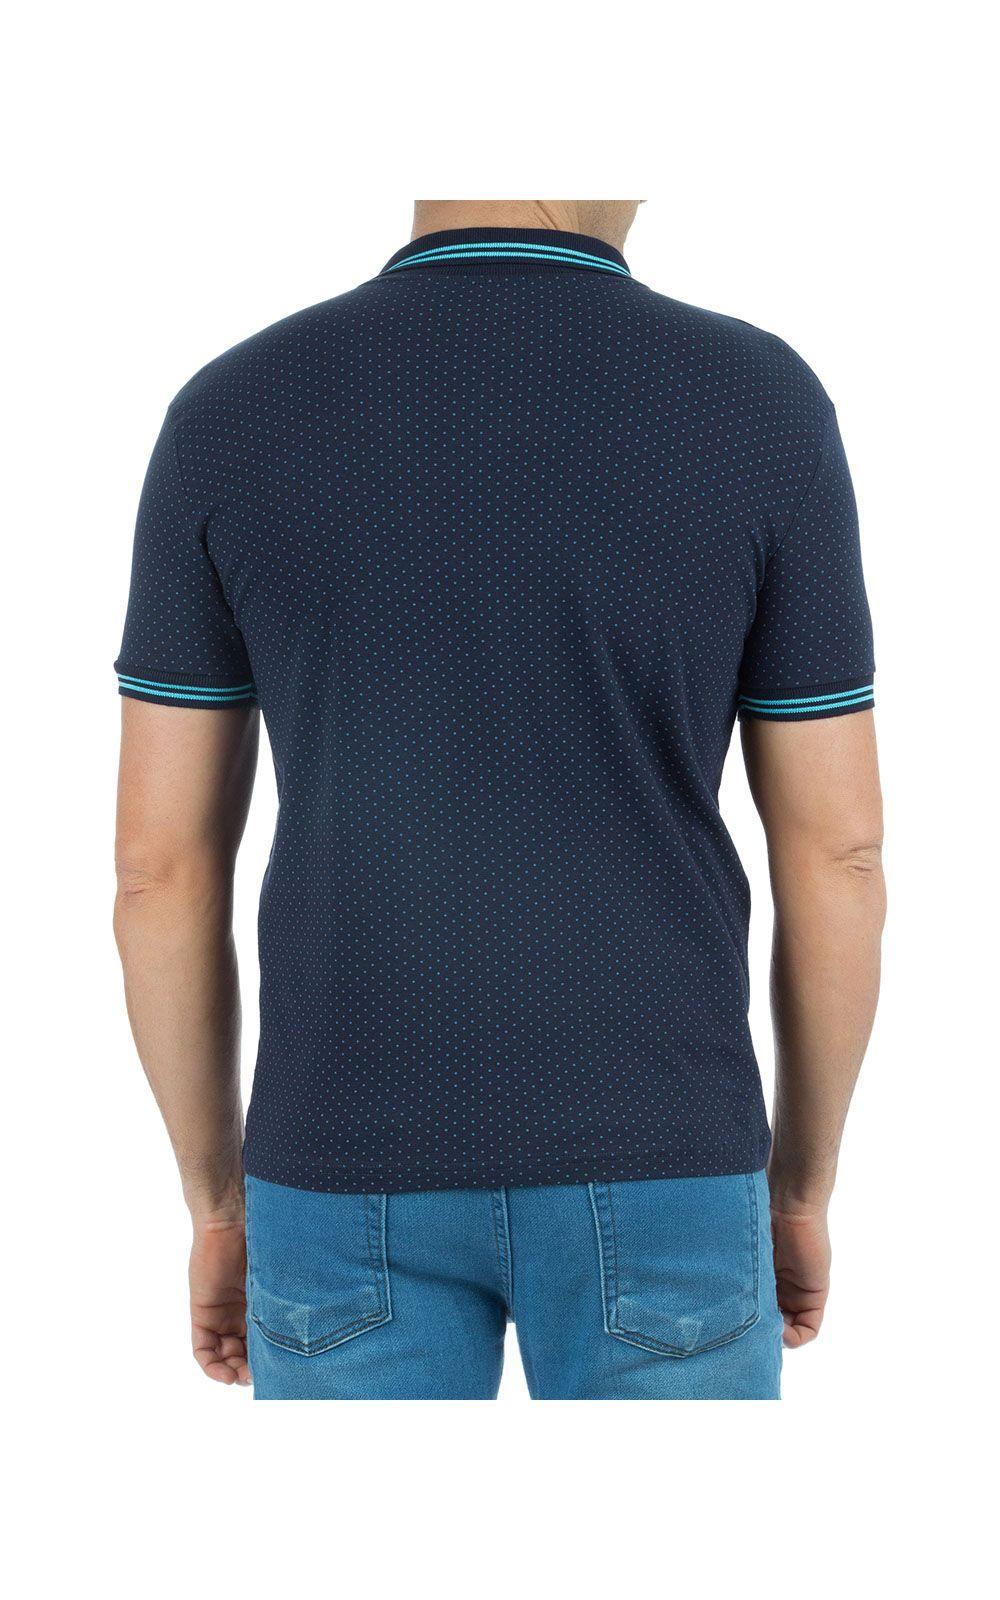 Foto 2 - Camisa Polo Masculina Azul Estampada